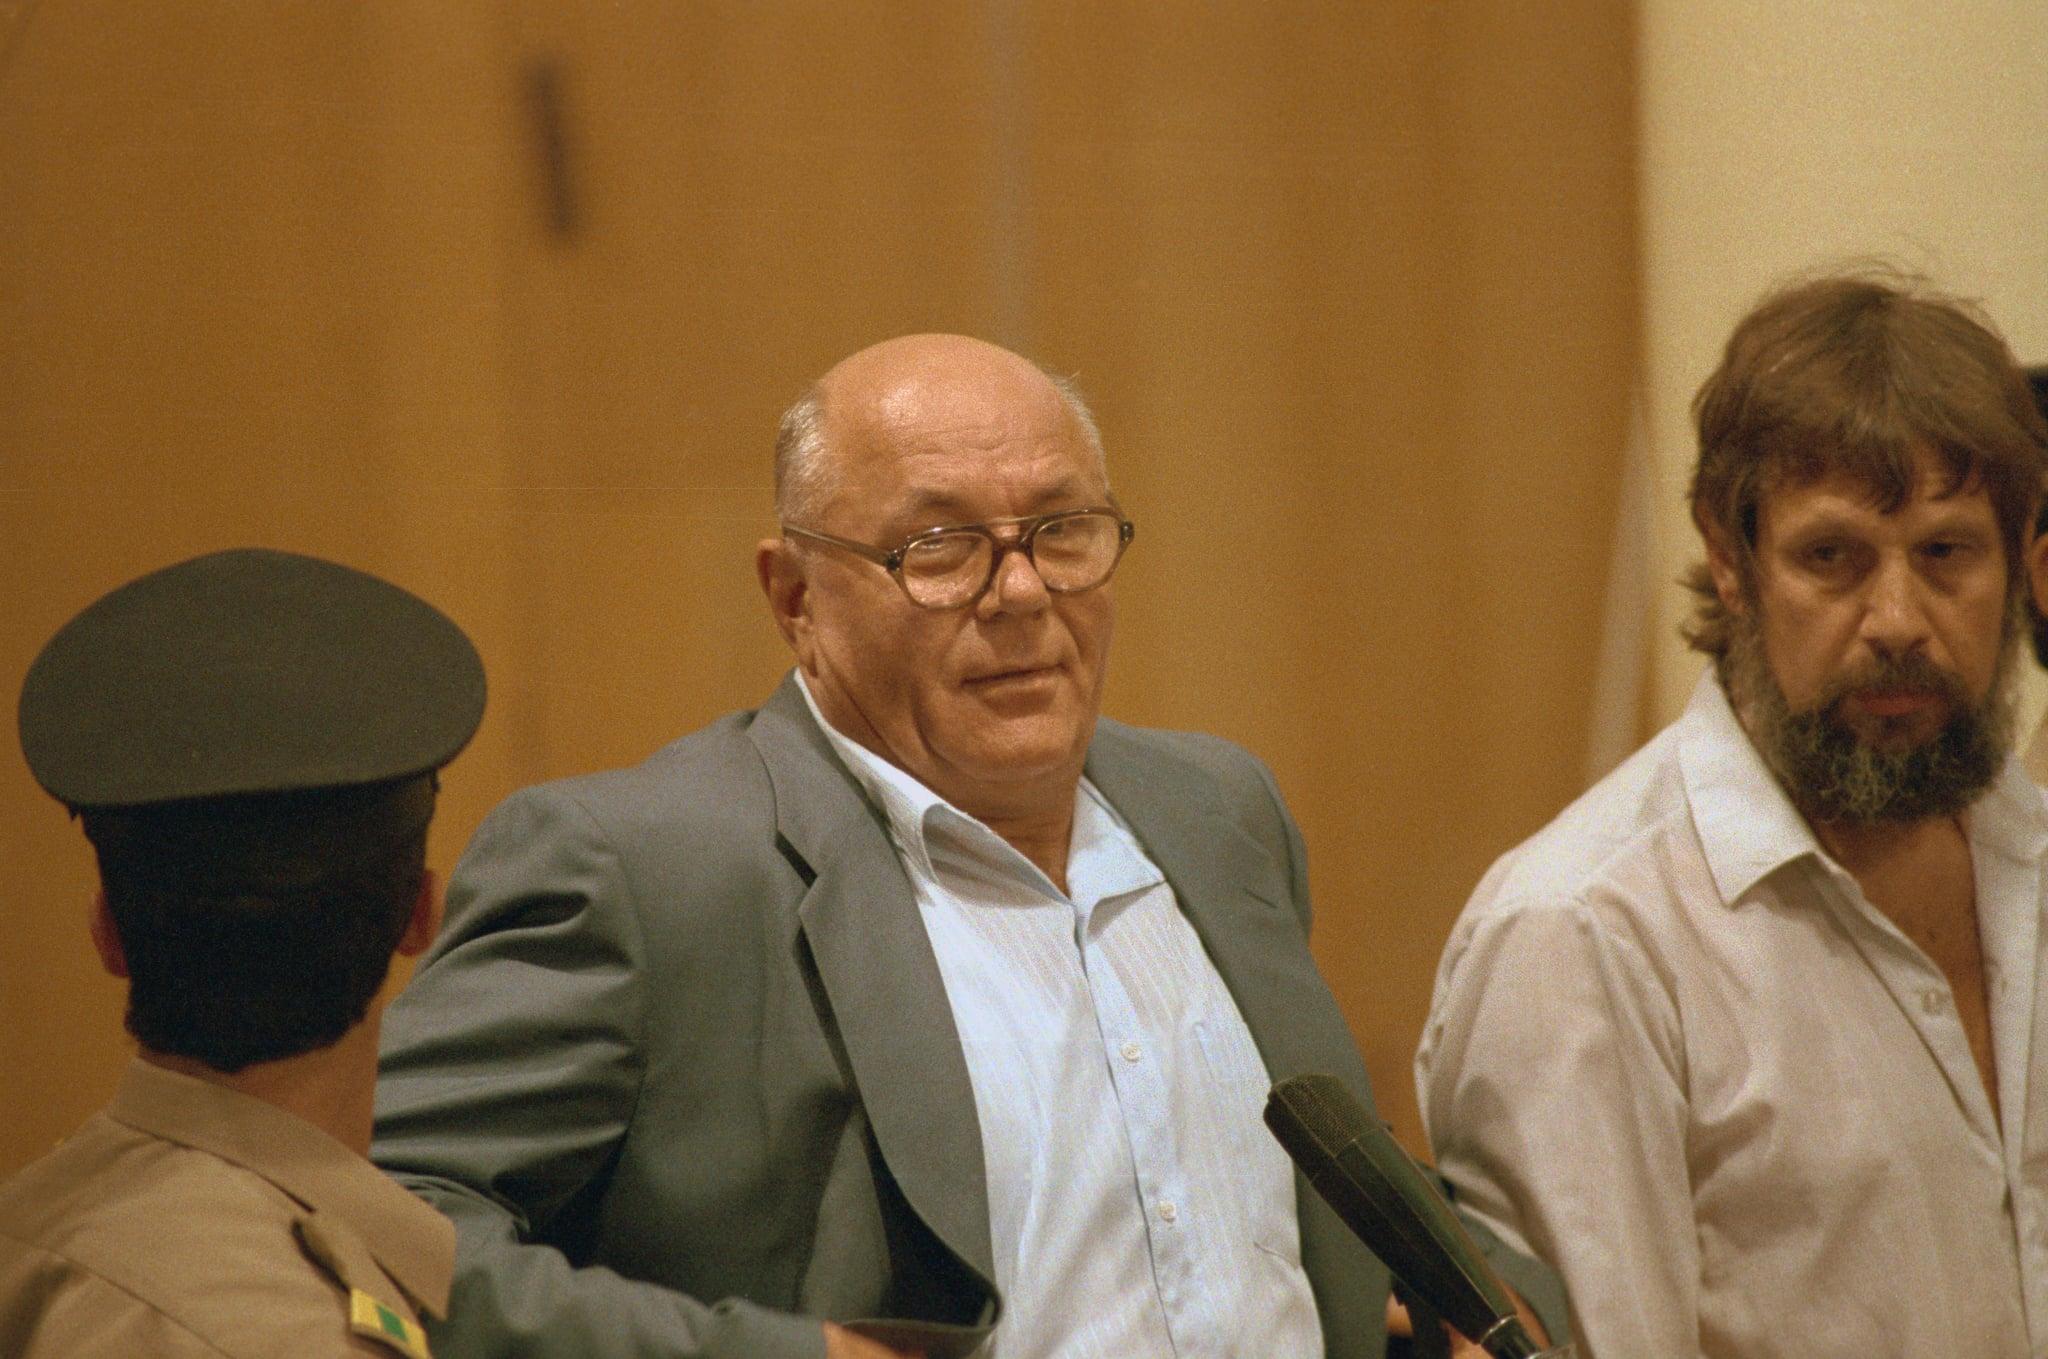 (Original Caption) John Demjanjuk, U.S. deported Ukranian Nazi prison guard at Israeli war-crimes trial.